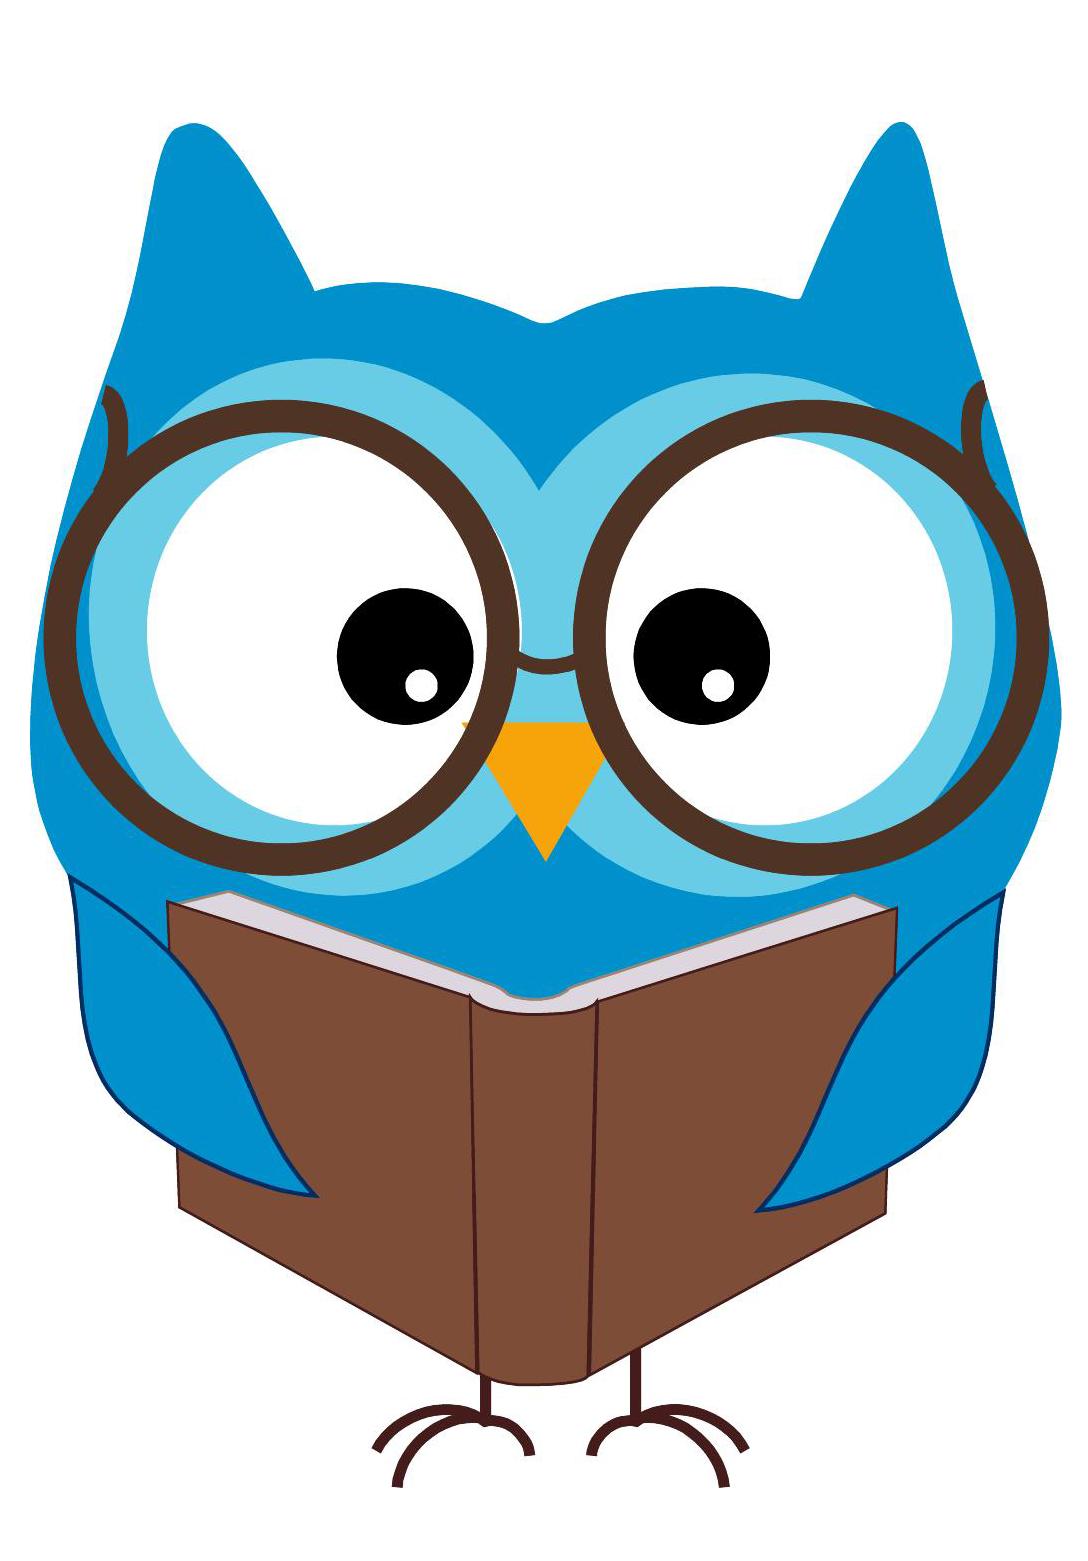 Reading Owl Clip Art Cliparts Co-Reading Owl Clip Art Cliparts Co-11